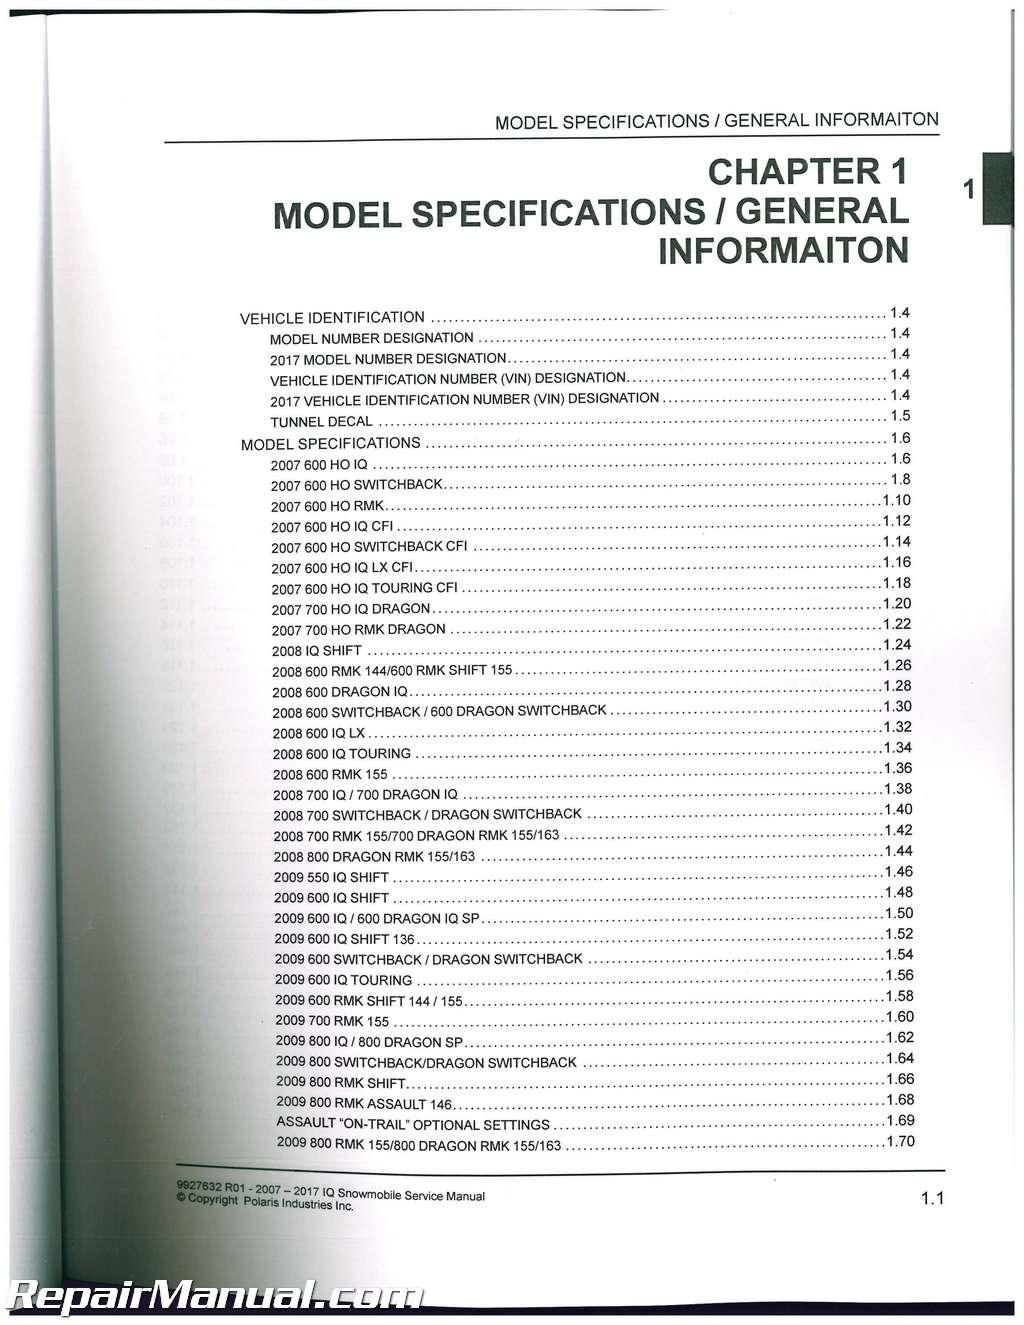 Mnl-5568] 2000 polaris 600 rmk snowmobile service manual free.